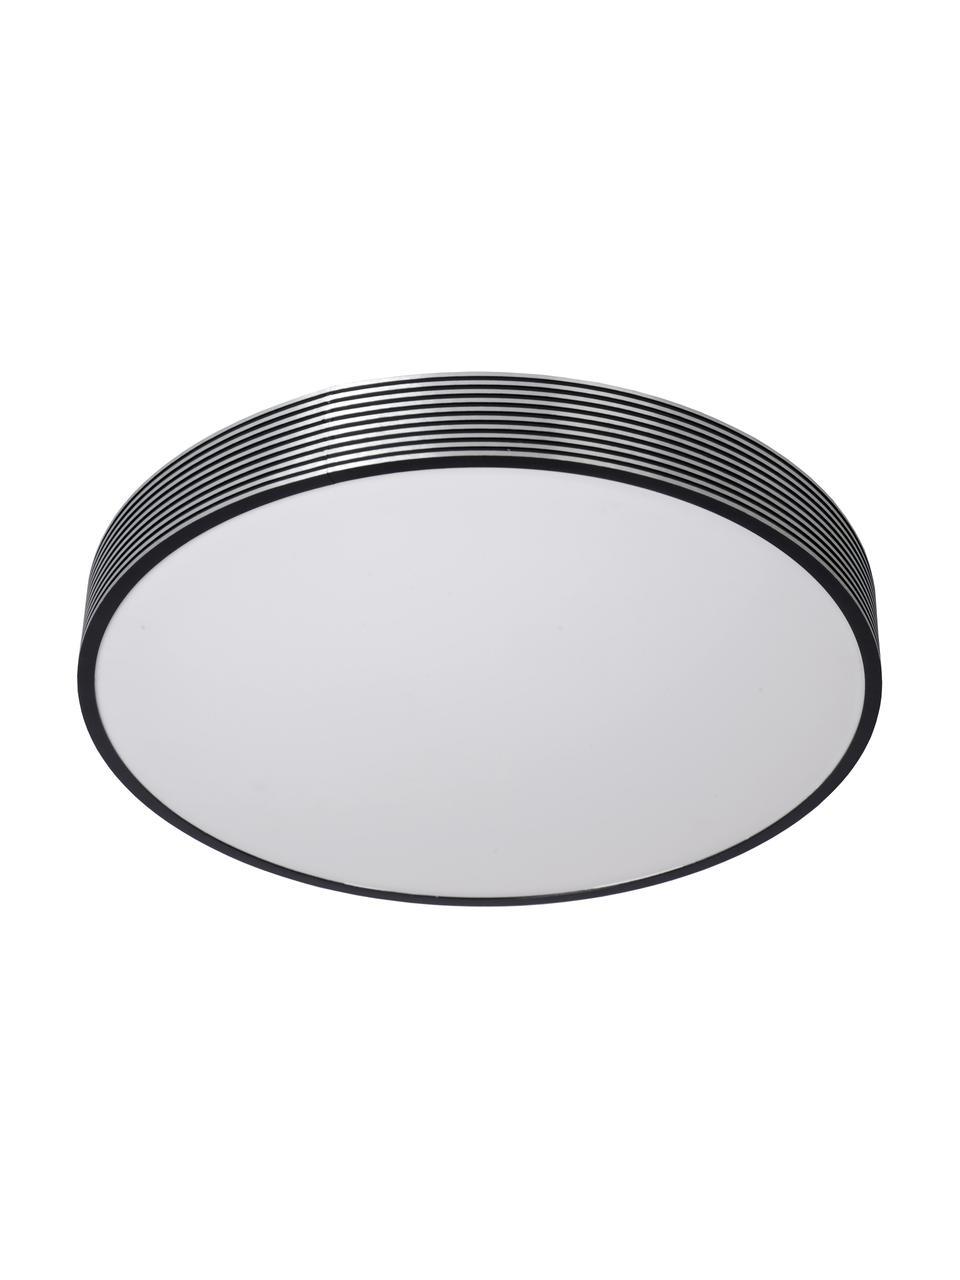 LED-Deckenleuchte Malin aus Metall, Lampenschirm: Metall, Diffusorscheibe: Acryl, Schwarz, Weiß, Ø 39 x H 7 cm